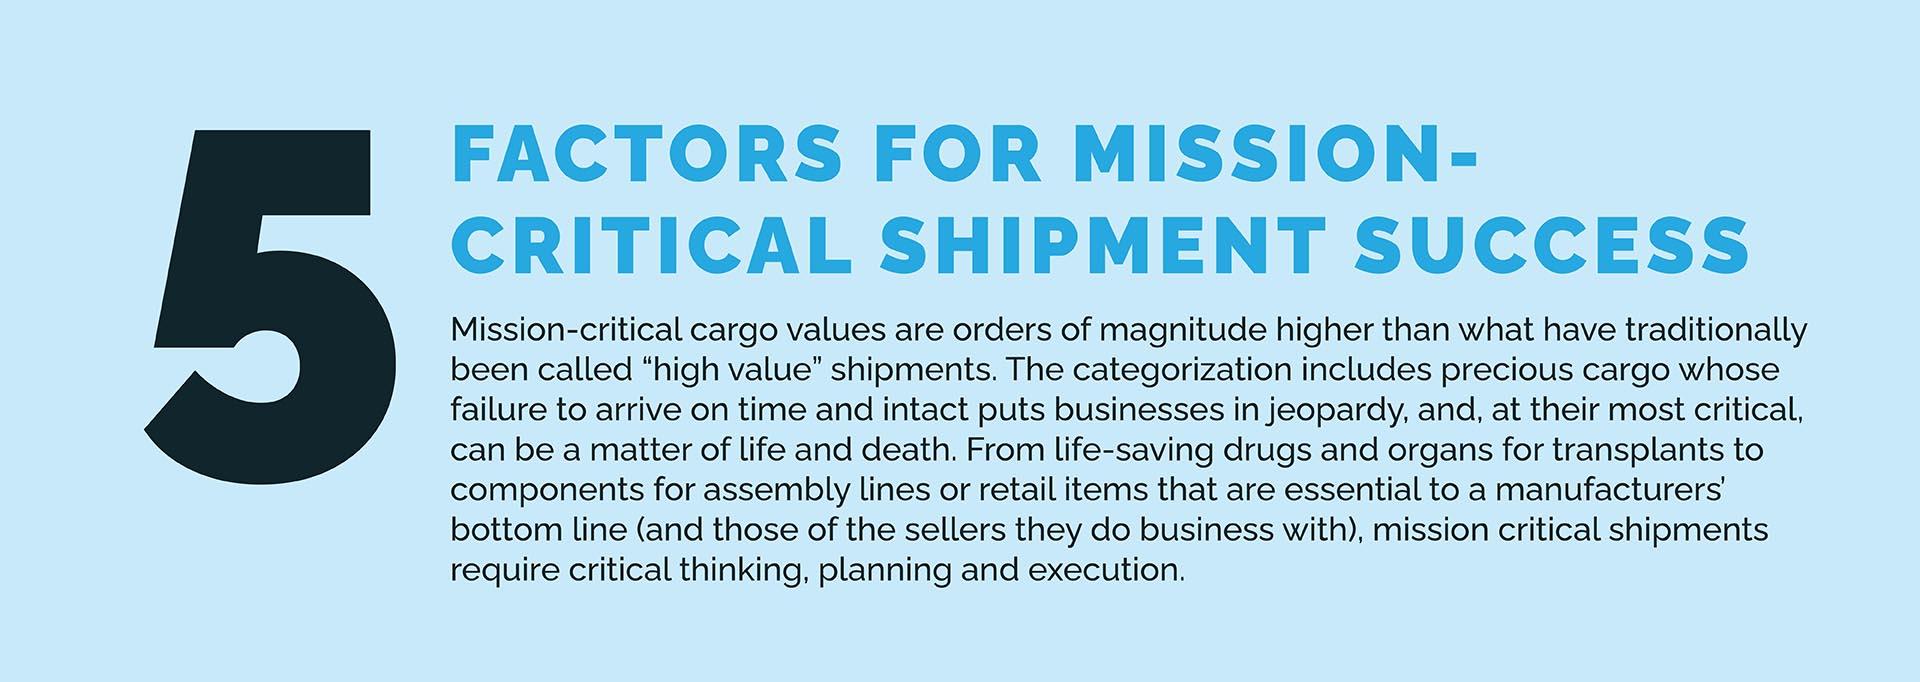 5 Factors for Mission-Critical Shipment Success